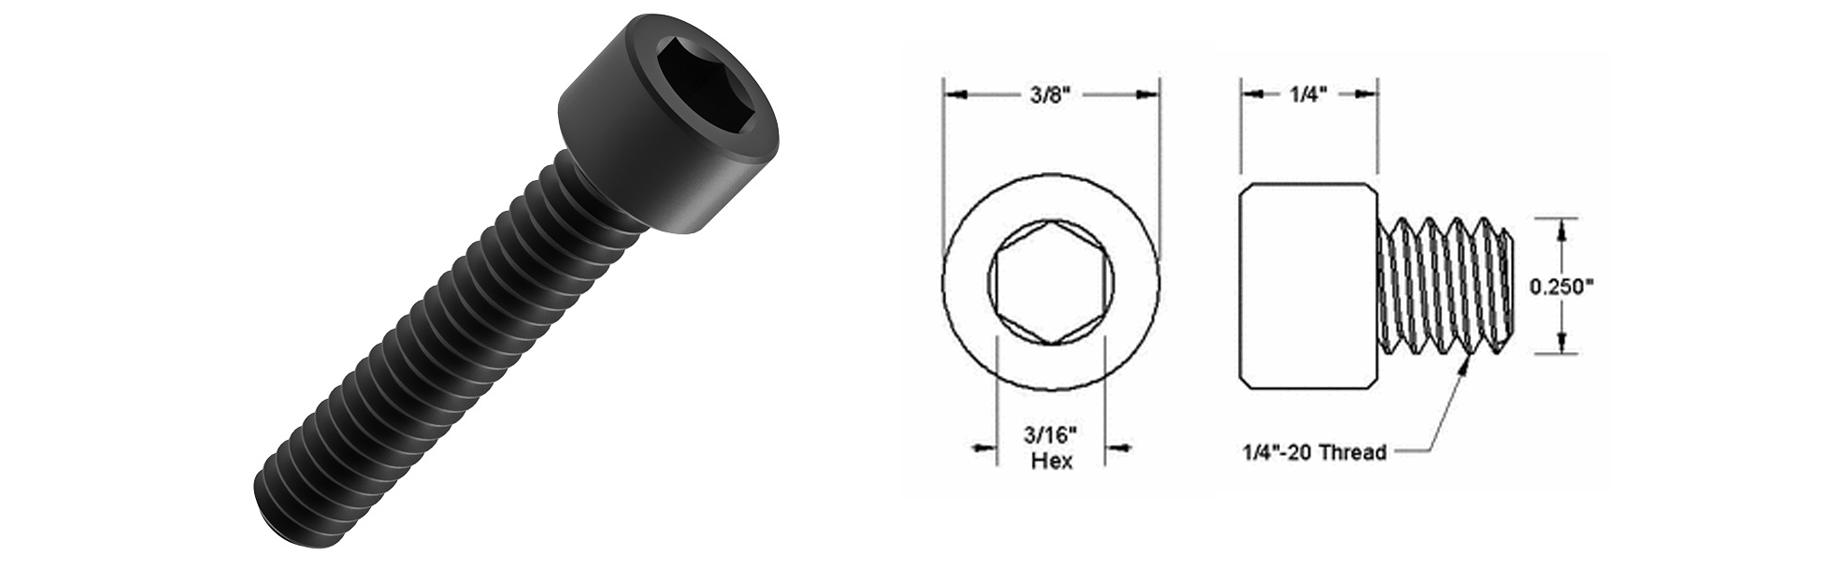 socket-head-machine-screw-black-oxide-.png